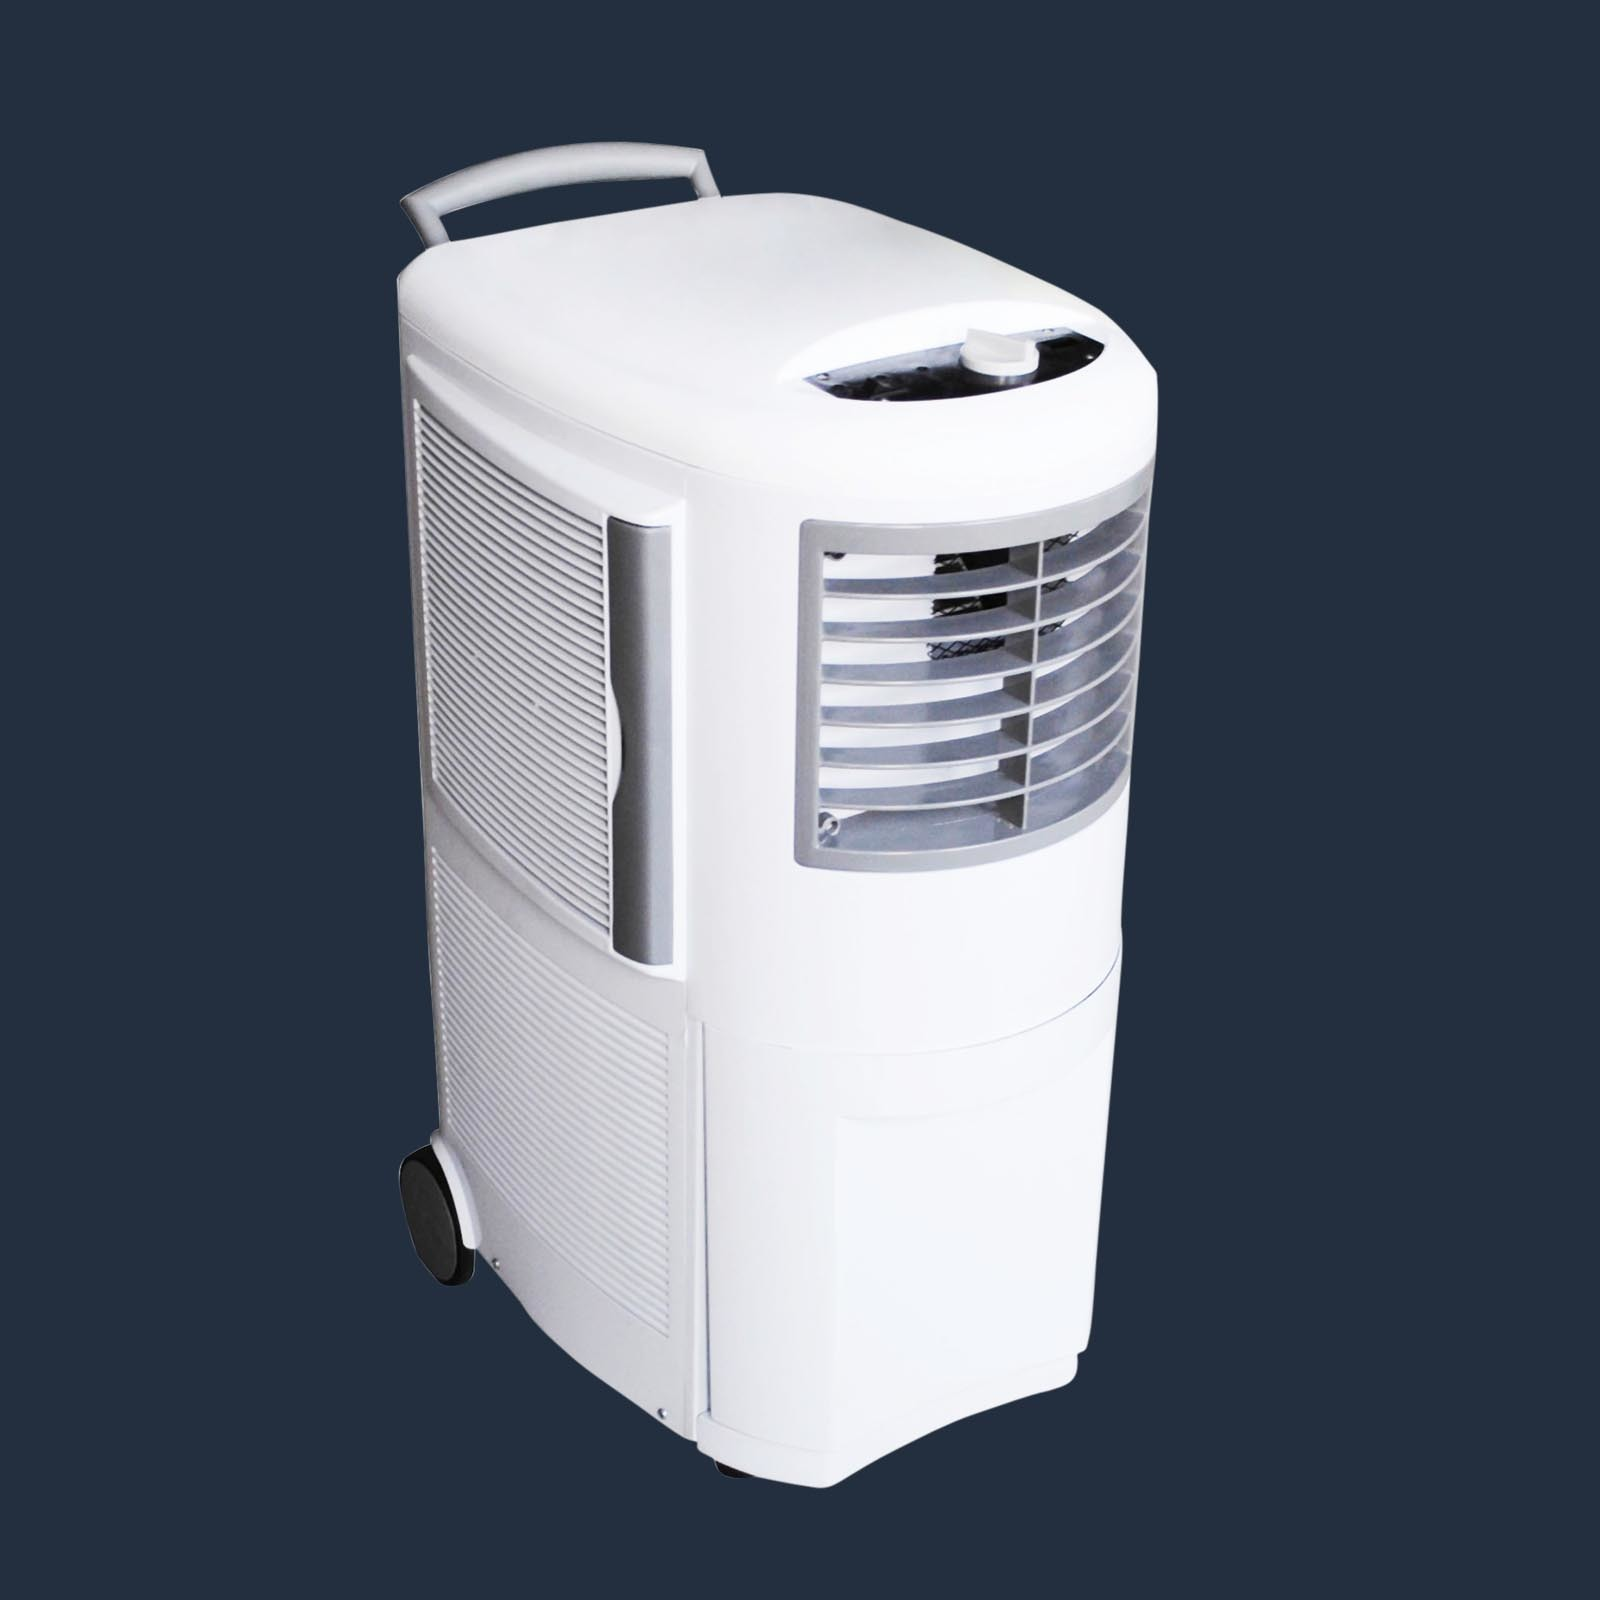 White Westinghouse Dehumidifier